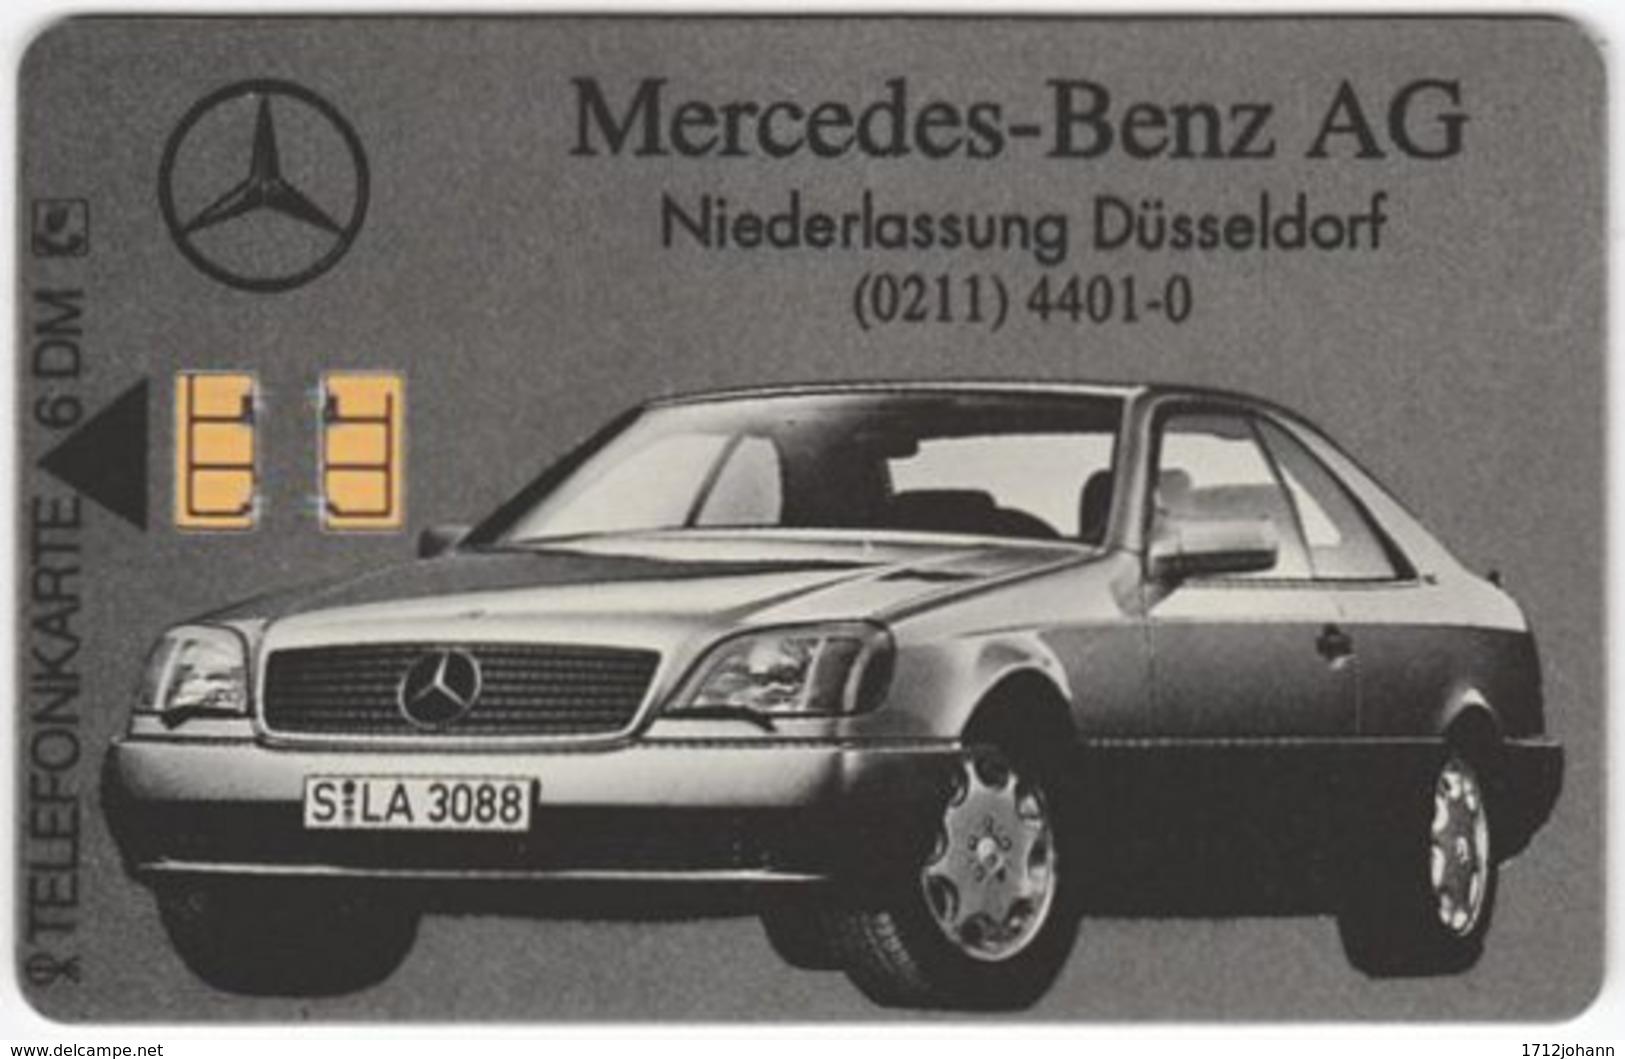 GERMANY O-Serie A-942 - 201 09.92 - Traffic, Car, Mercedes - MINT - O-Series: Kundenserie Vom Sammlerservice Ausgeschlossen